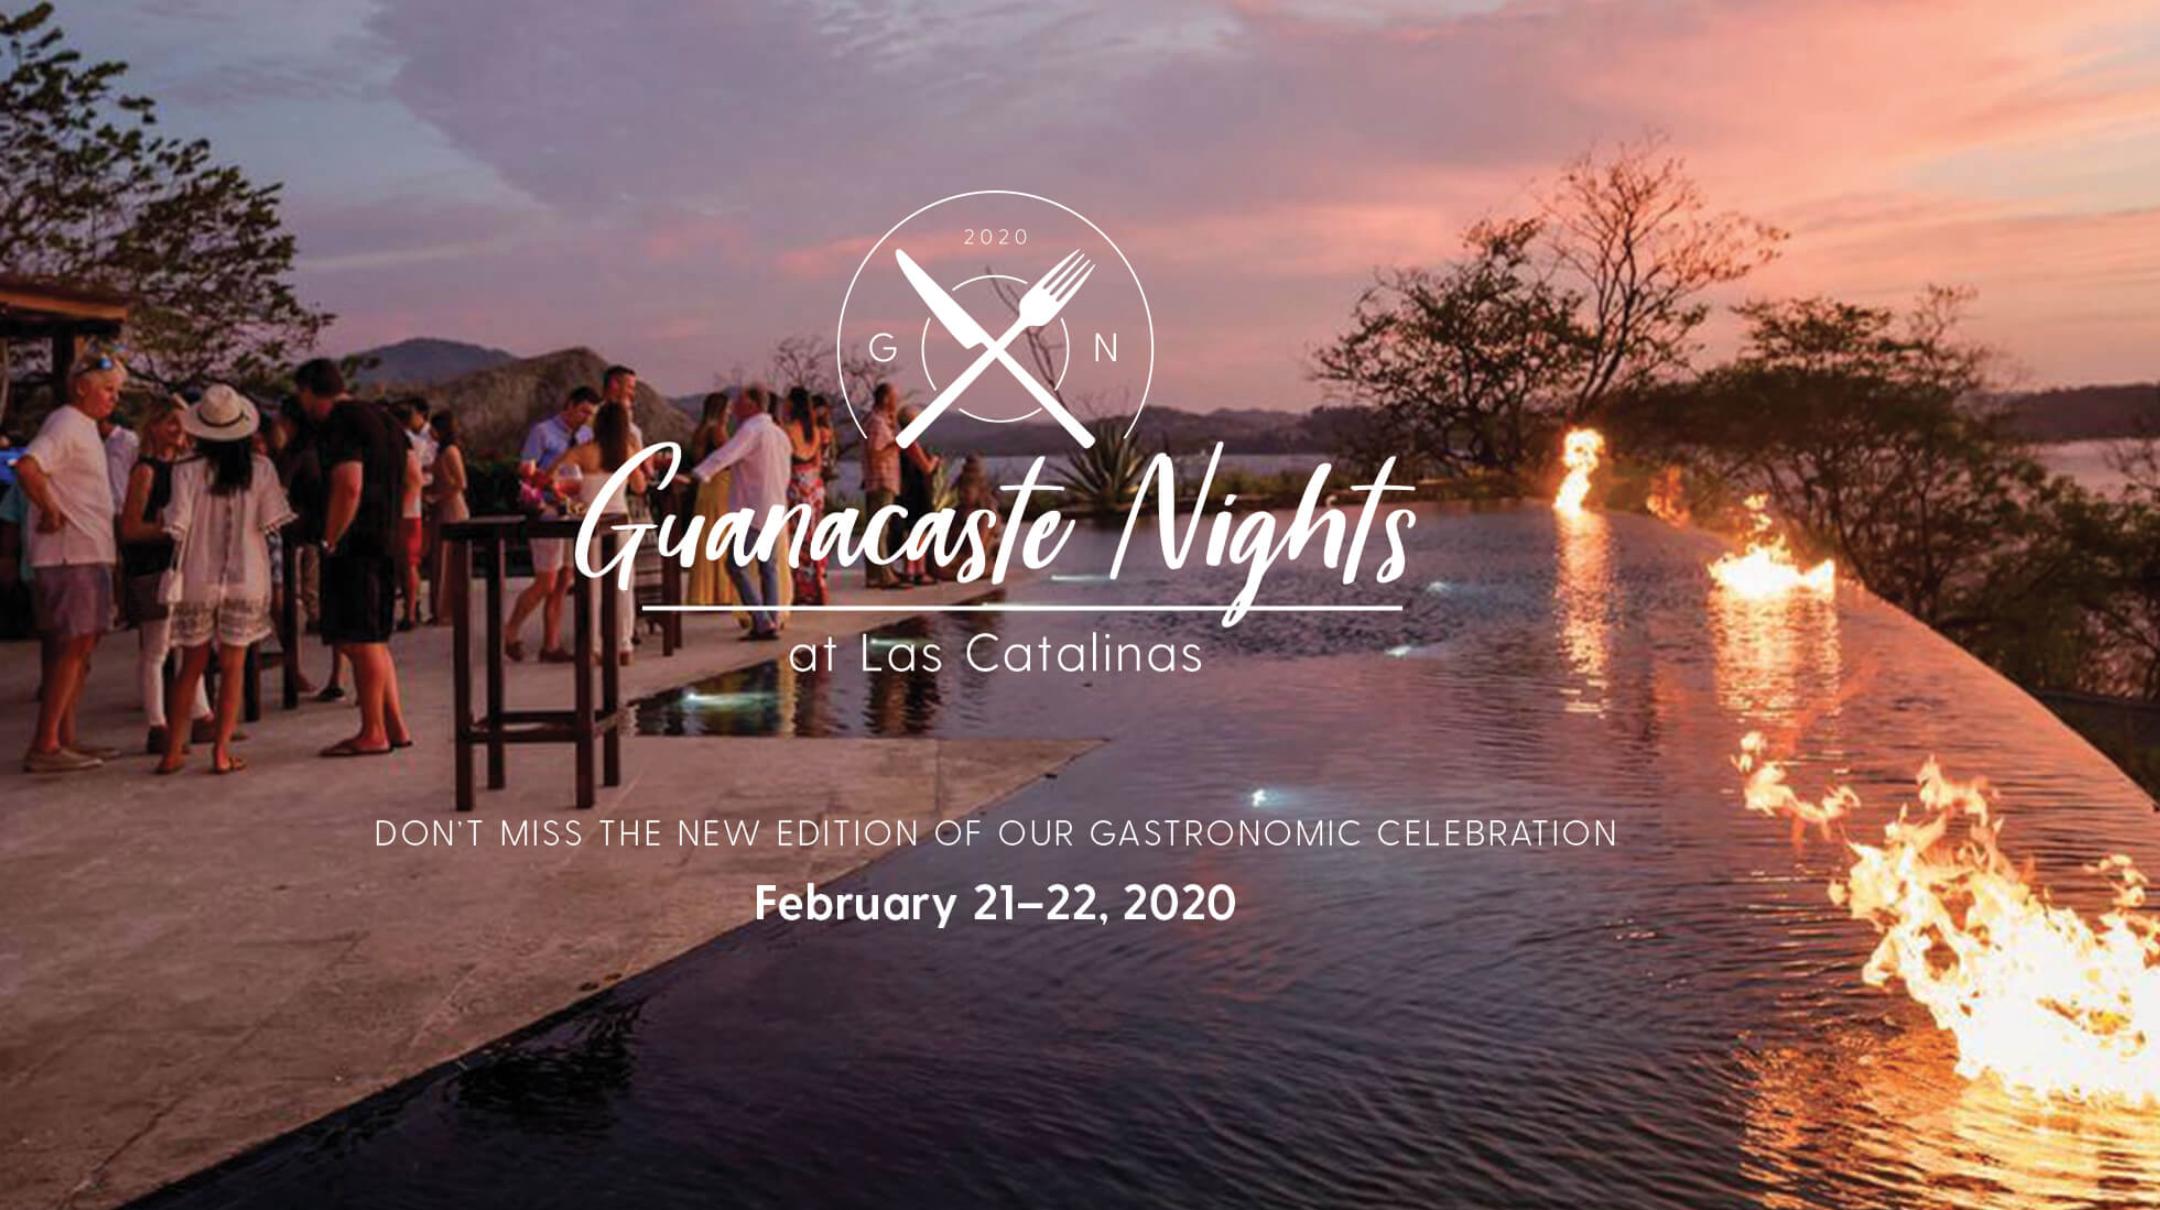 Guanacaste Nights-February 21st, 4pm-10pm